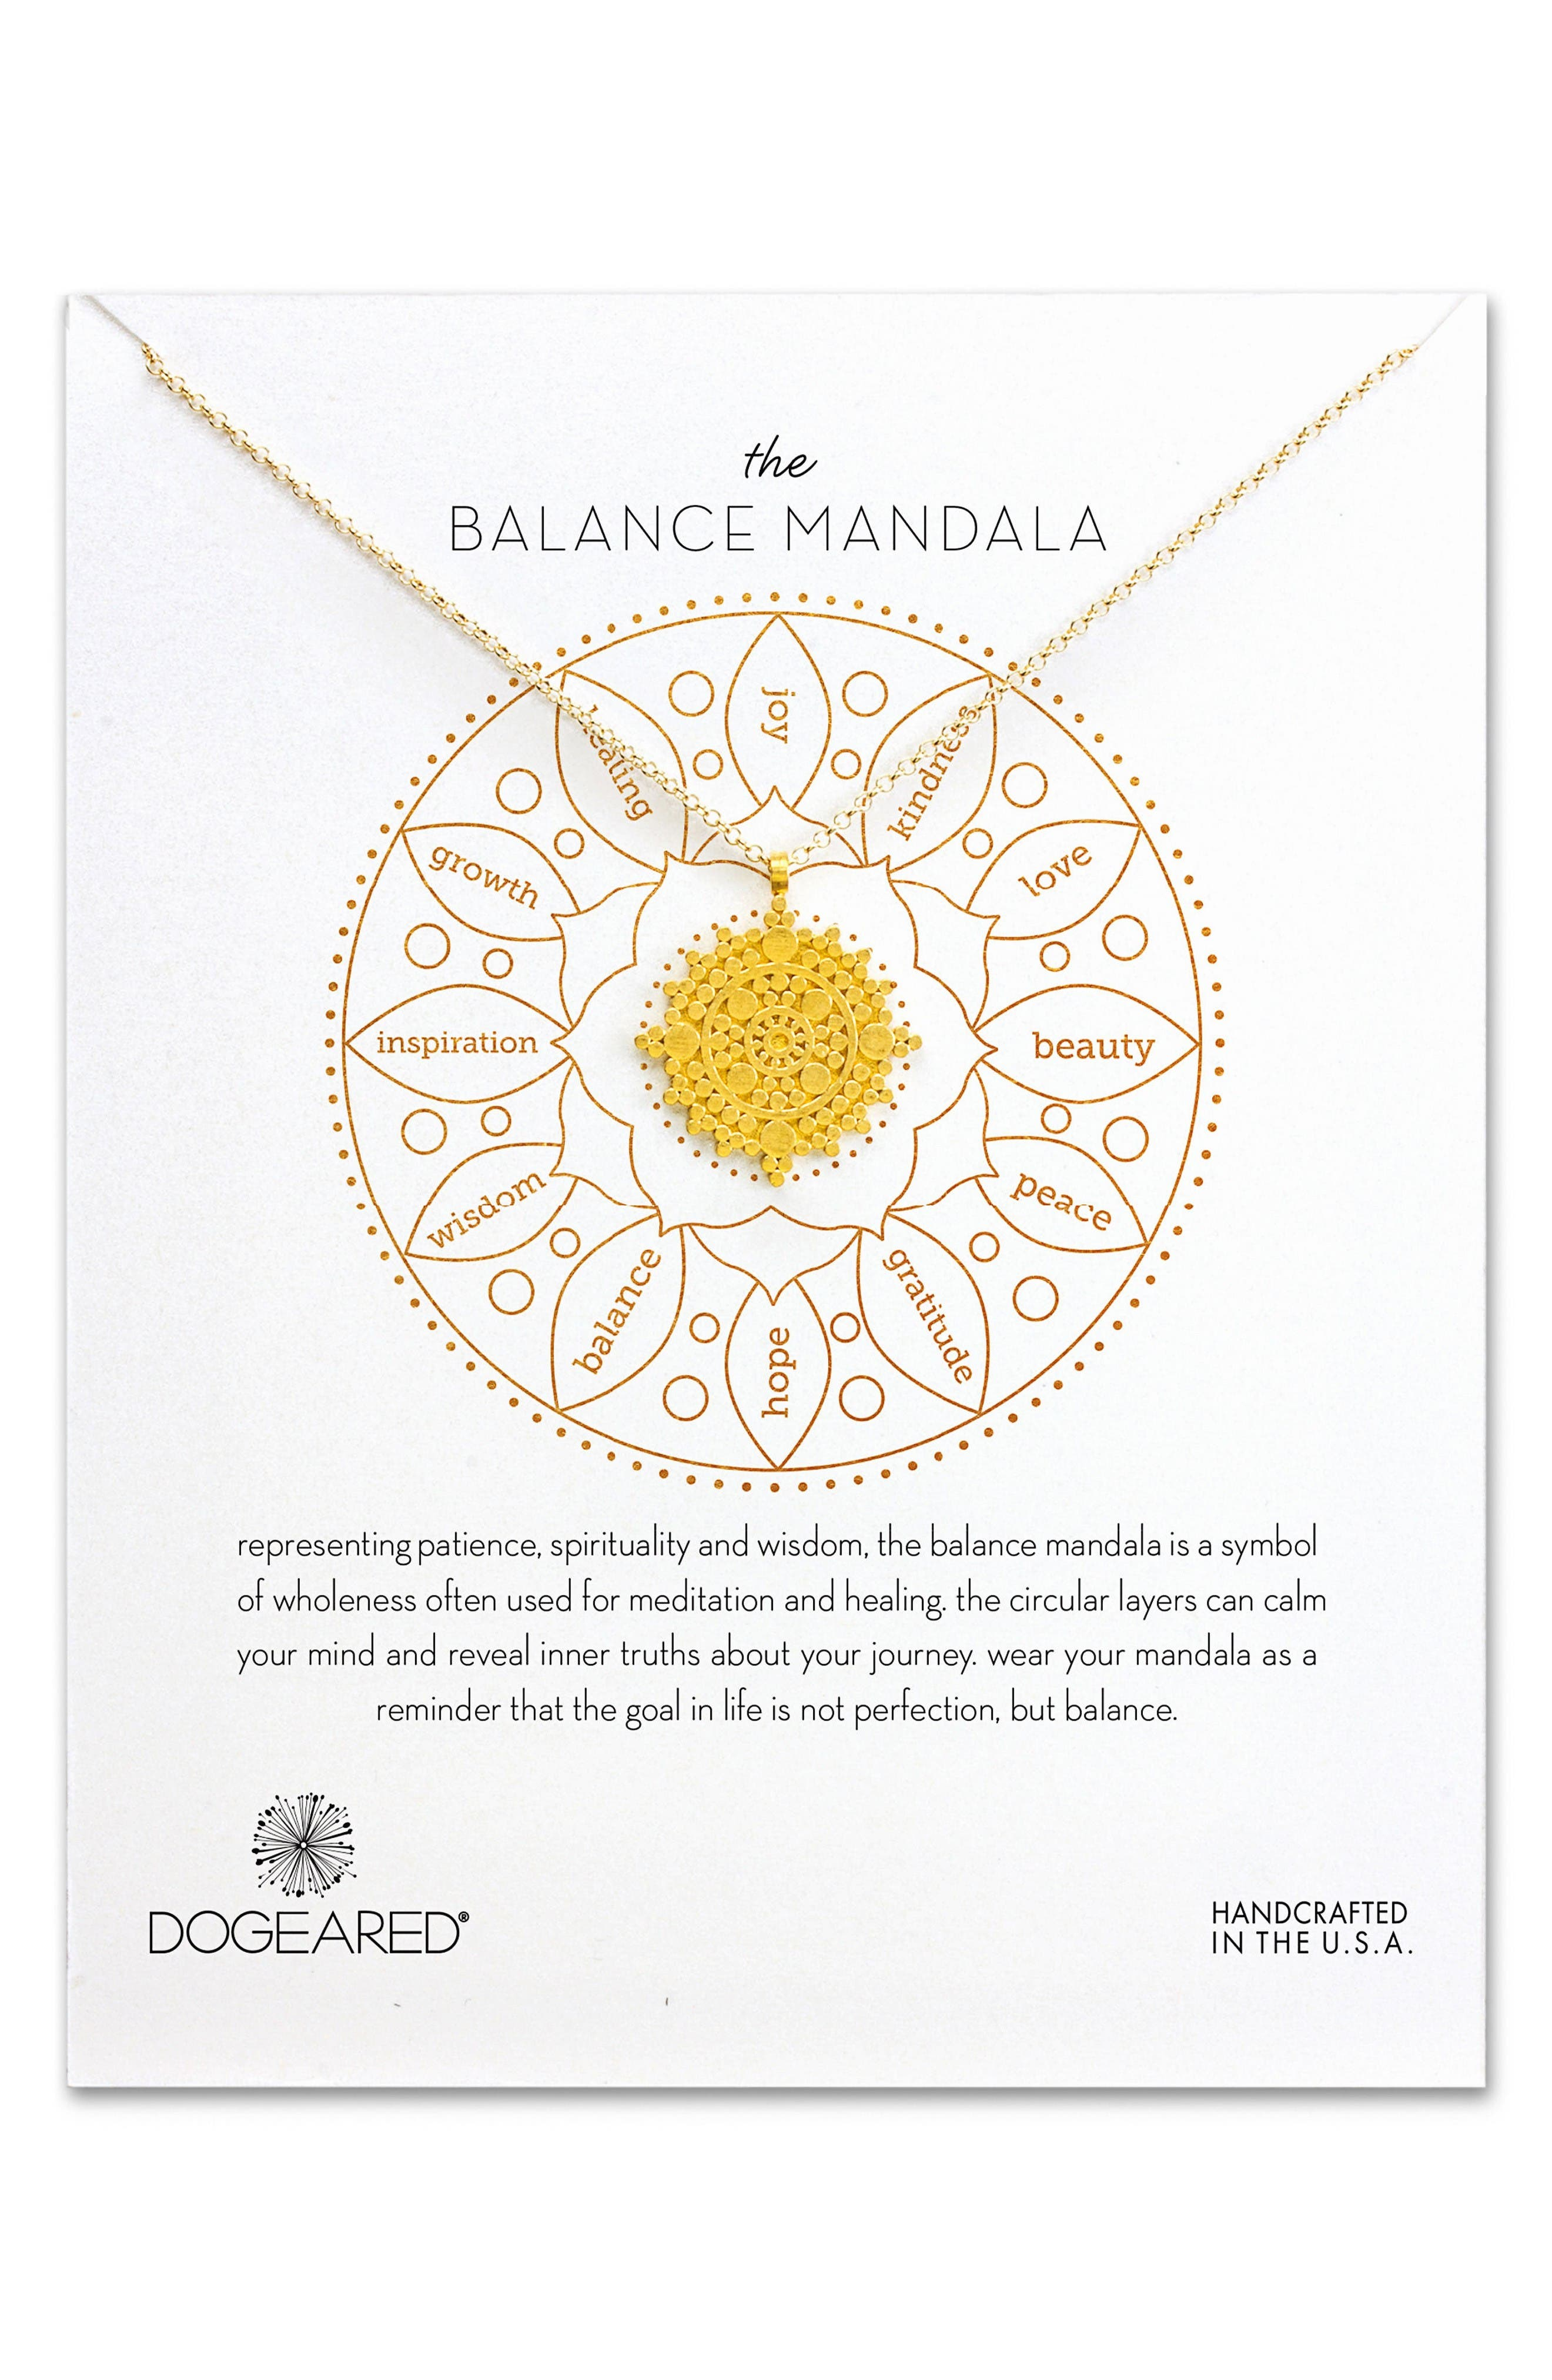 Alternate Image 1 Selected - Dogeared The Balance Mandala Pendant Necklace